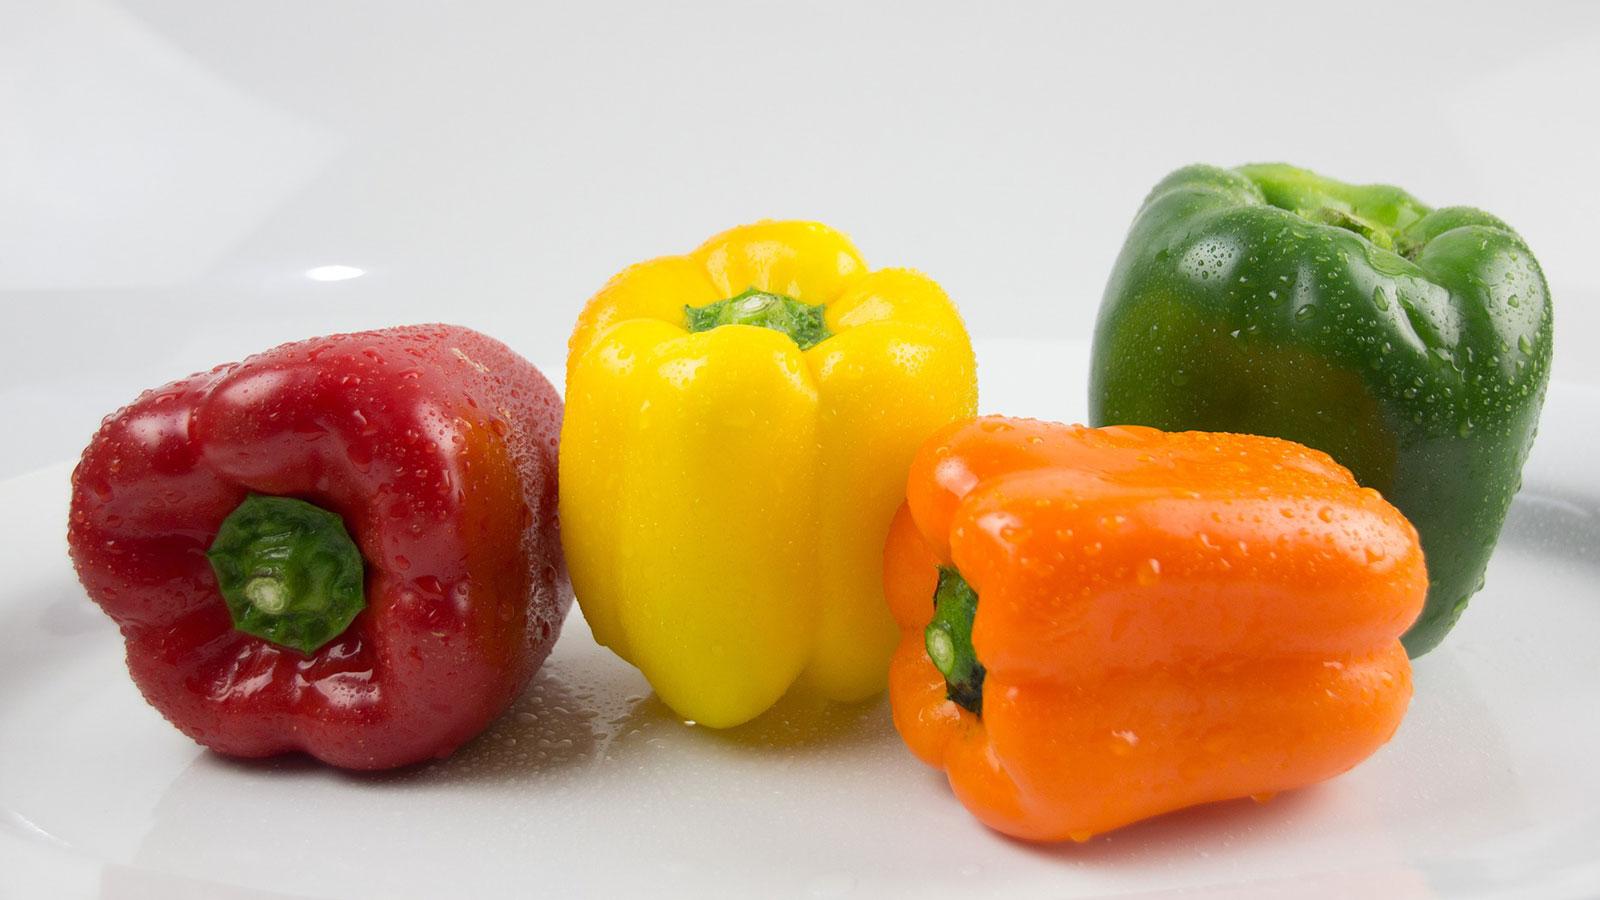 ¡Ponle color a tu comida!